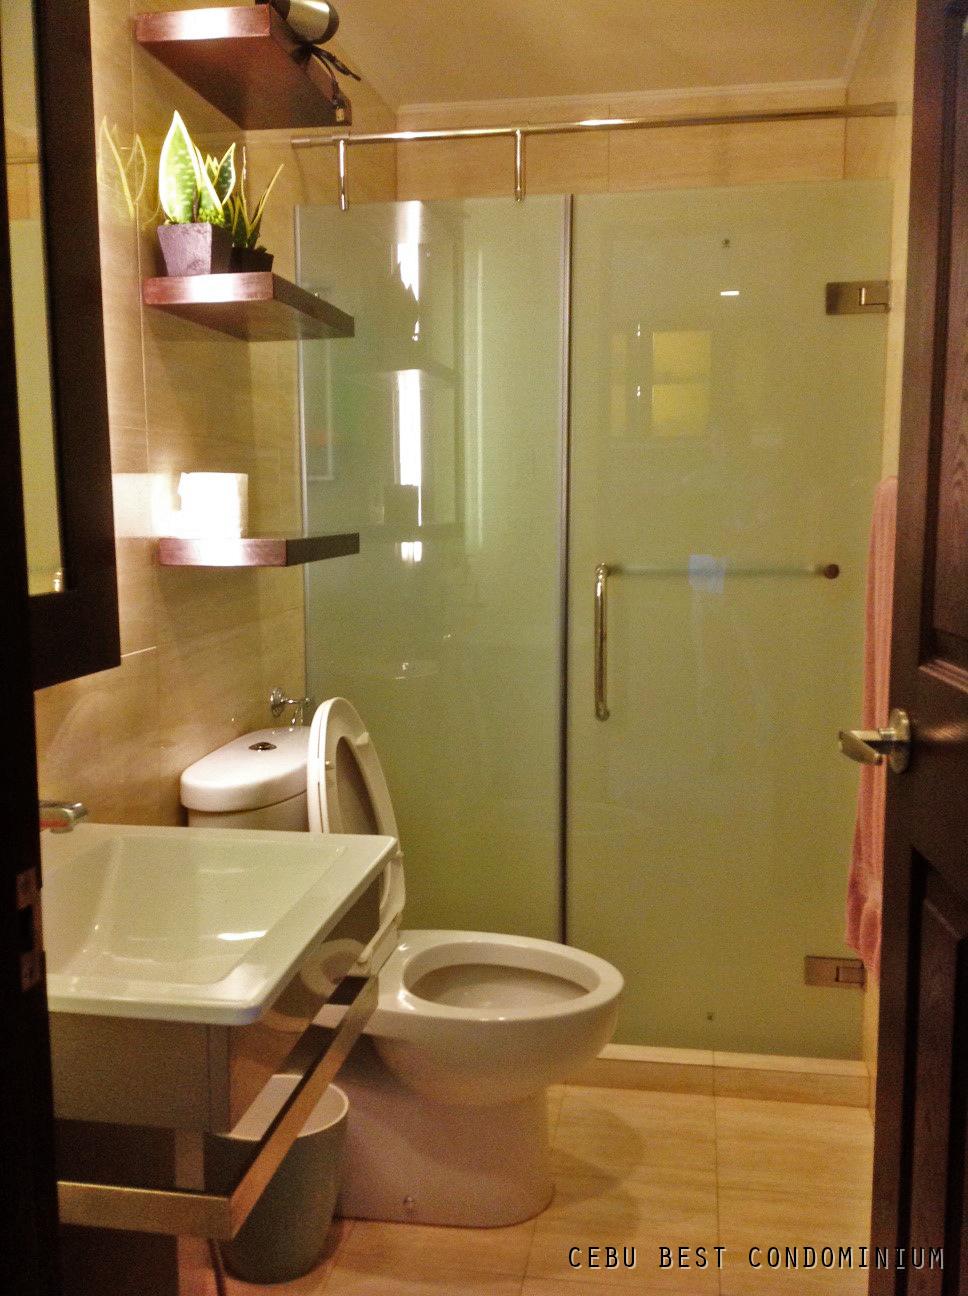 Avalon 2 Bedroom for sale comfort area